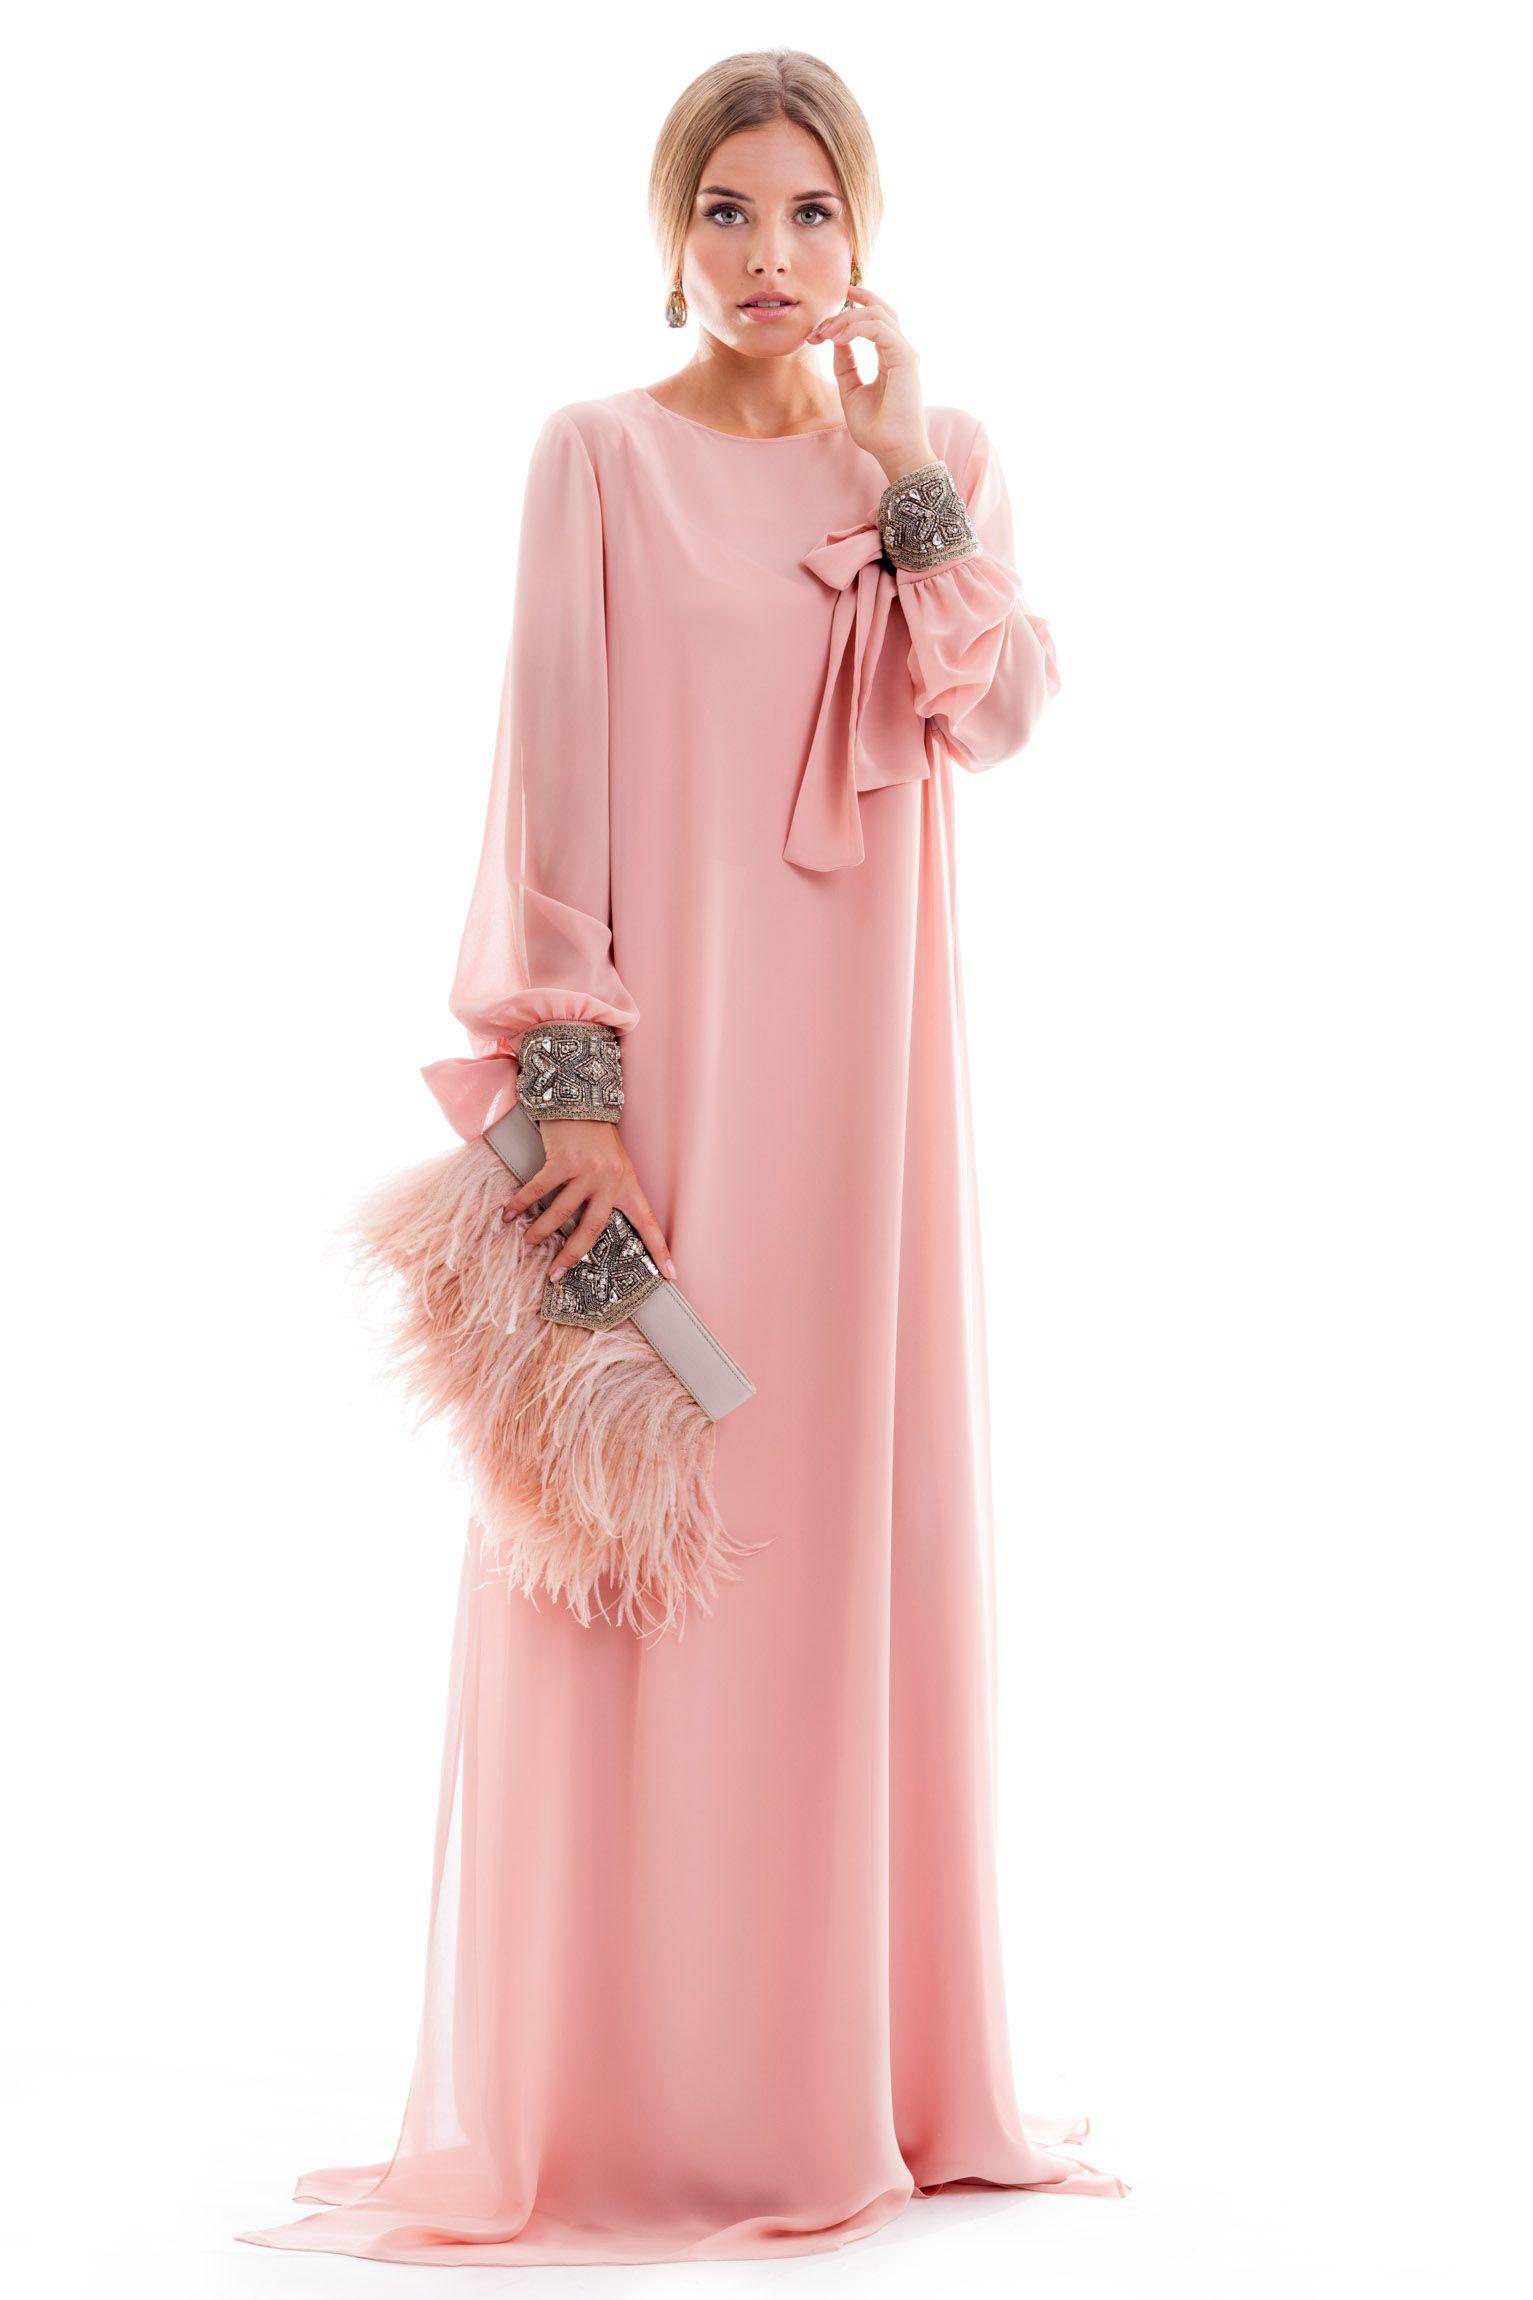 Pin de Eleni Ioannou en F - Gowns | Pinterest | Vestido sari, Puños ...